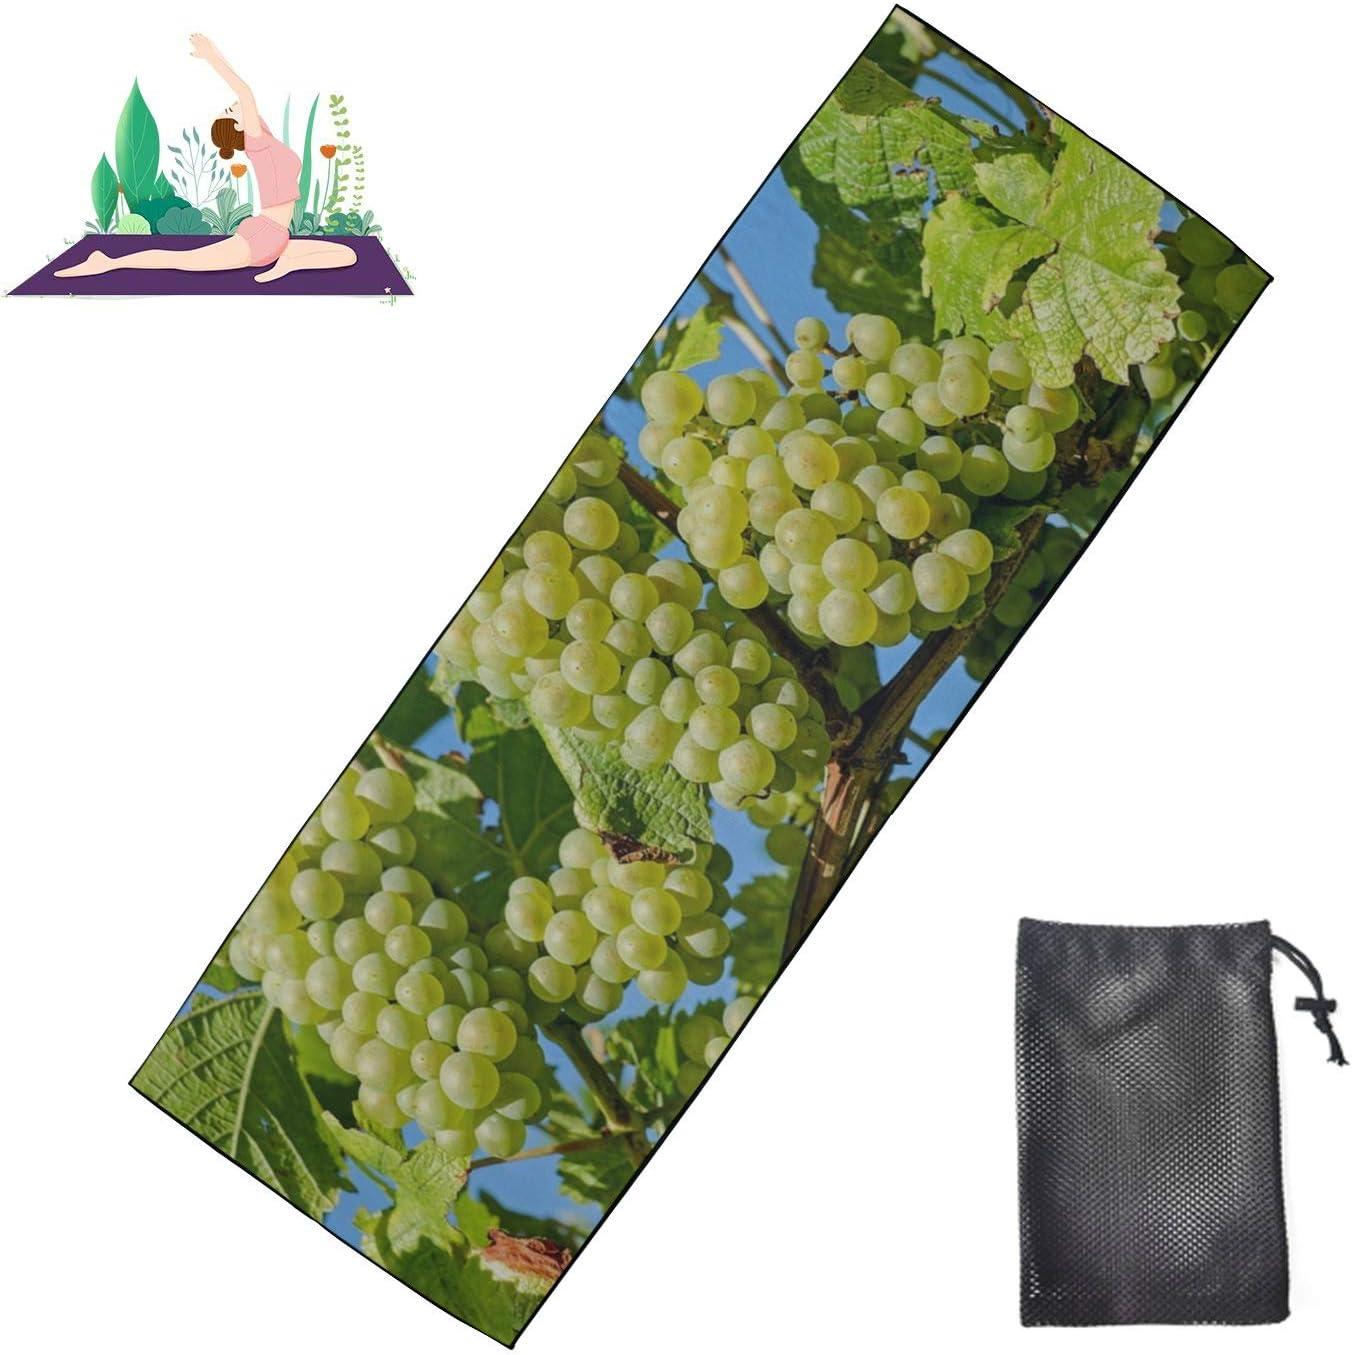 Max 64% OFF Huqalh Yoga Hot Towel Grapes Winegrowing Grapevine Fruit Yo Outlet sale feature Vine